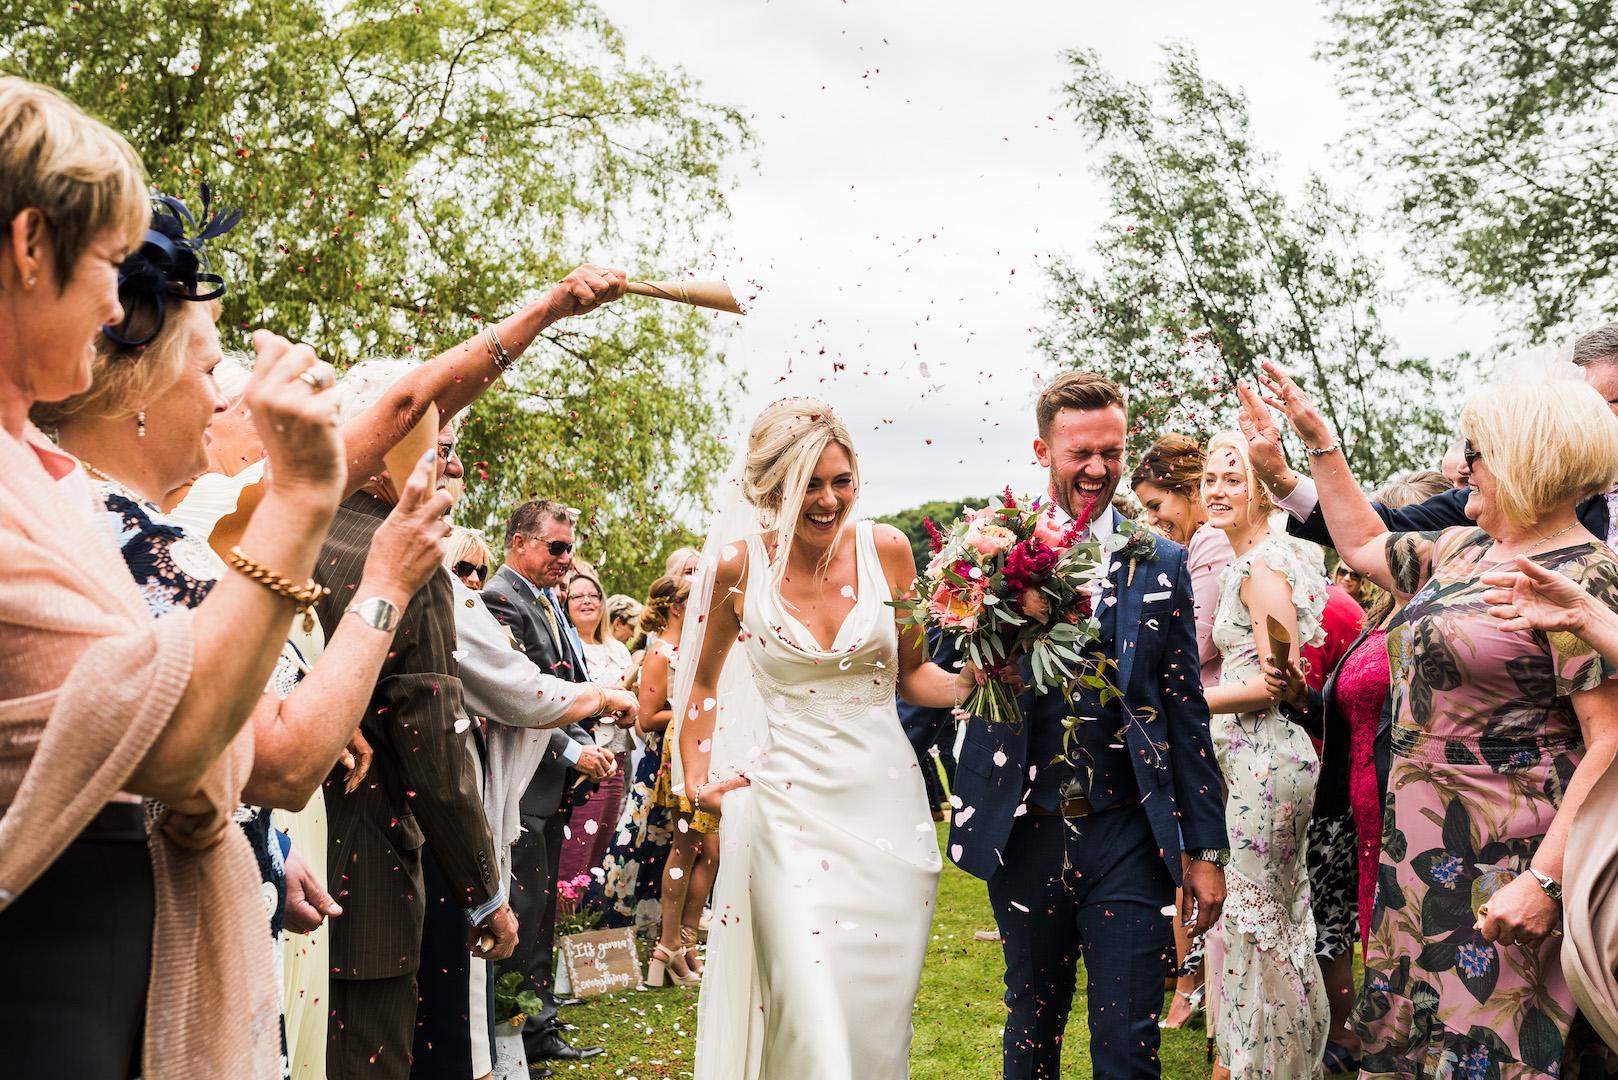 Sarah and Joe's PapaKata Sperry Wedding: Confetti throw